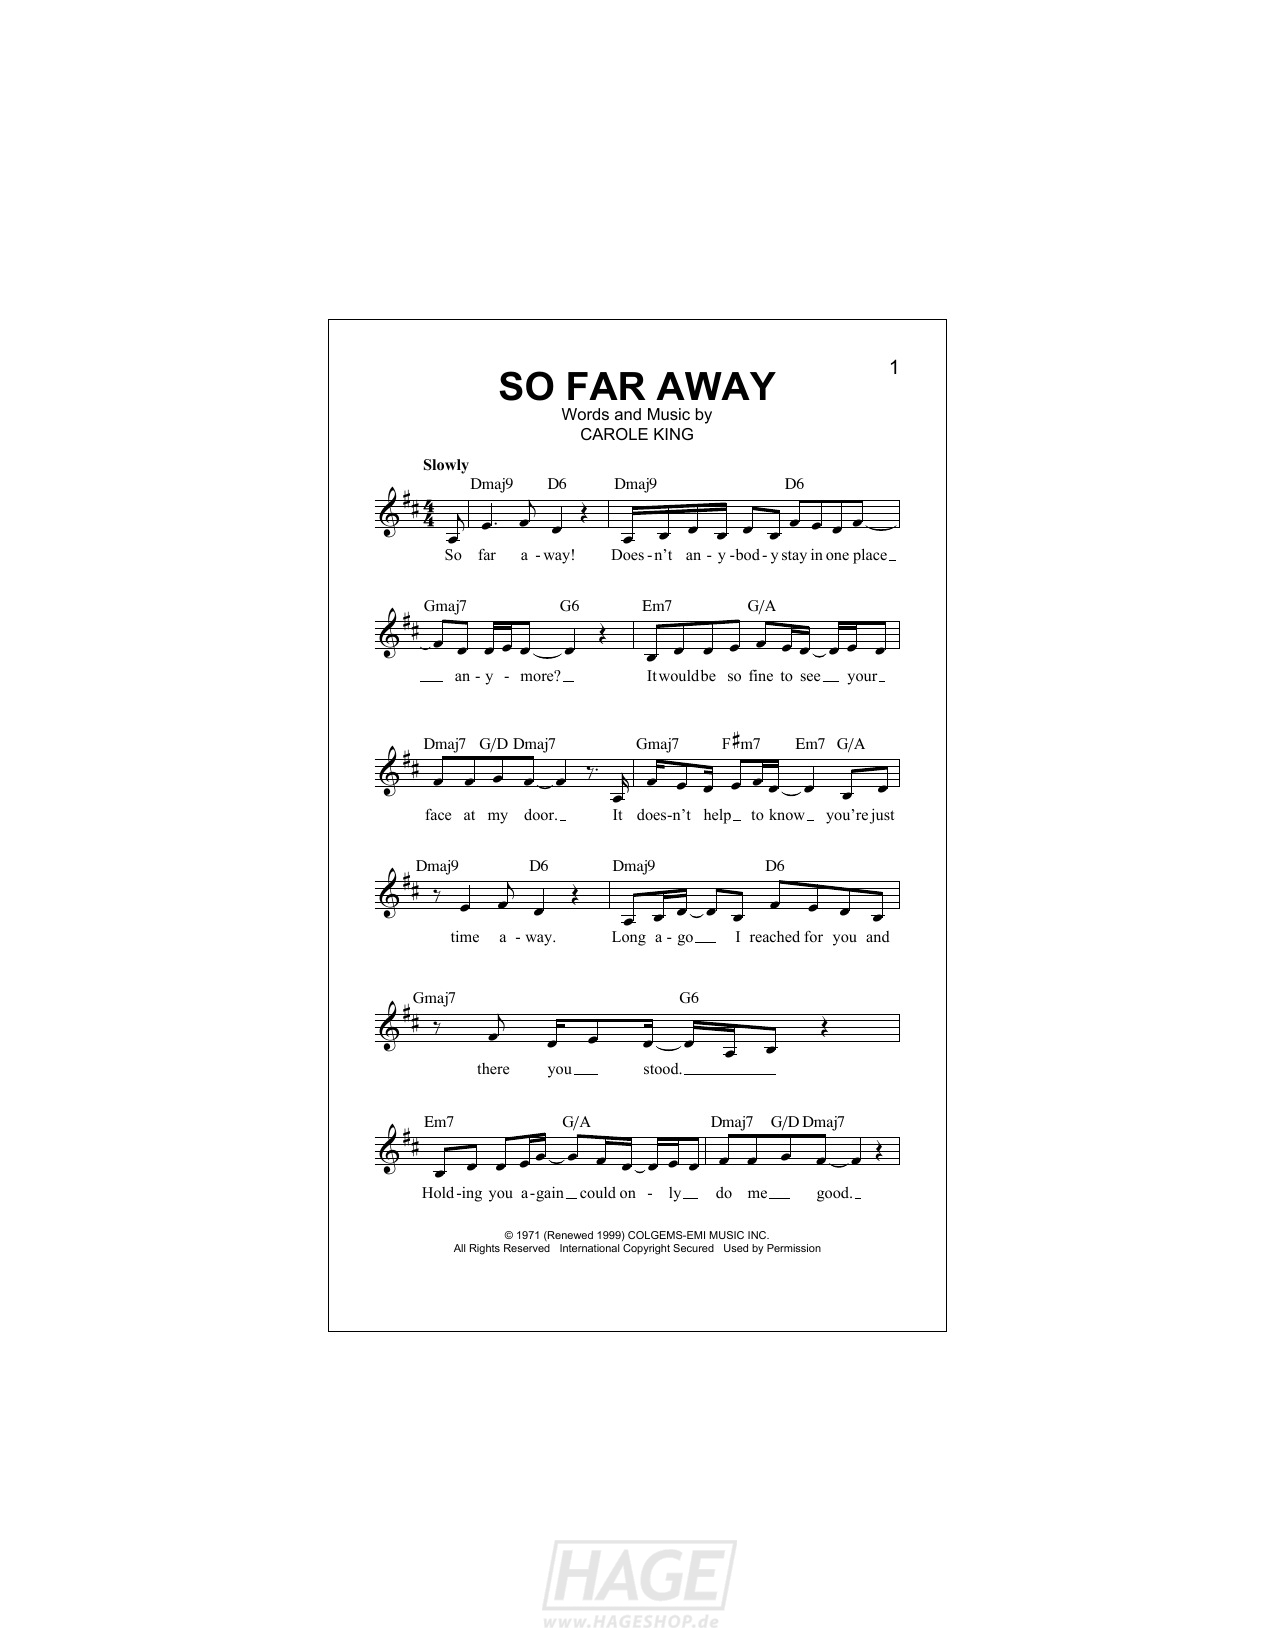 So Far Away - Carole King - Noten Druckvorschau